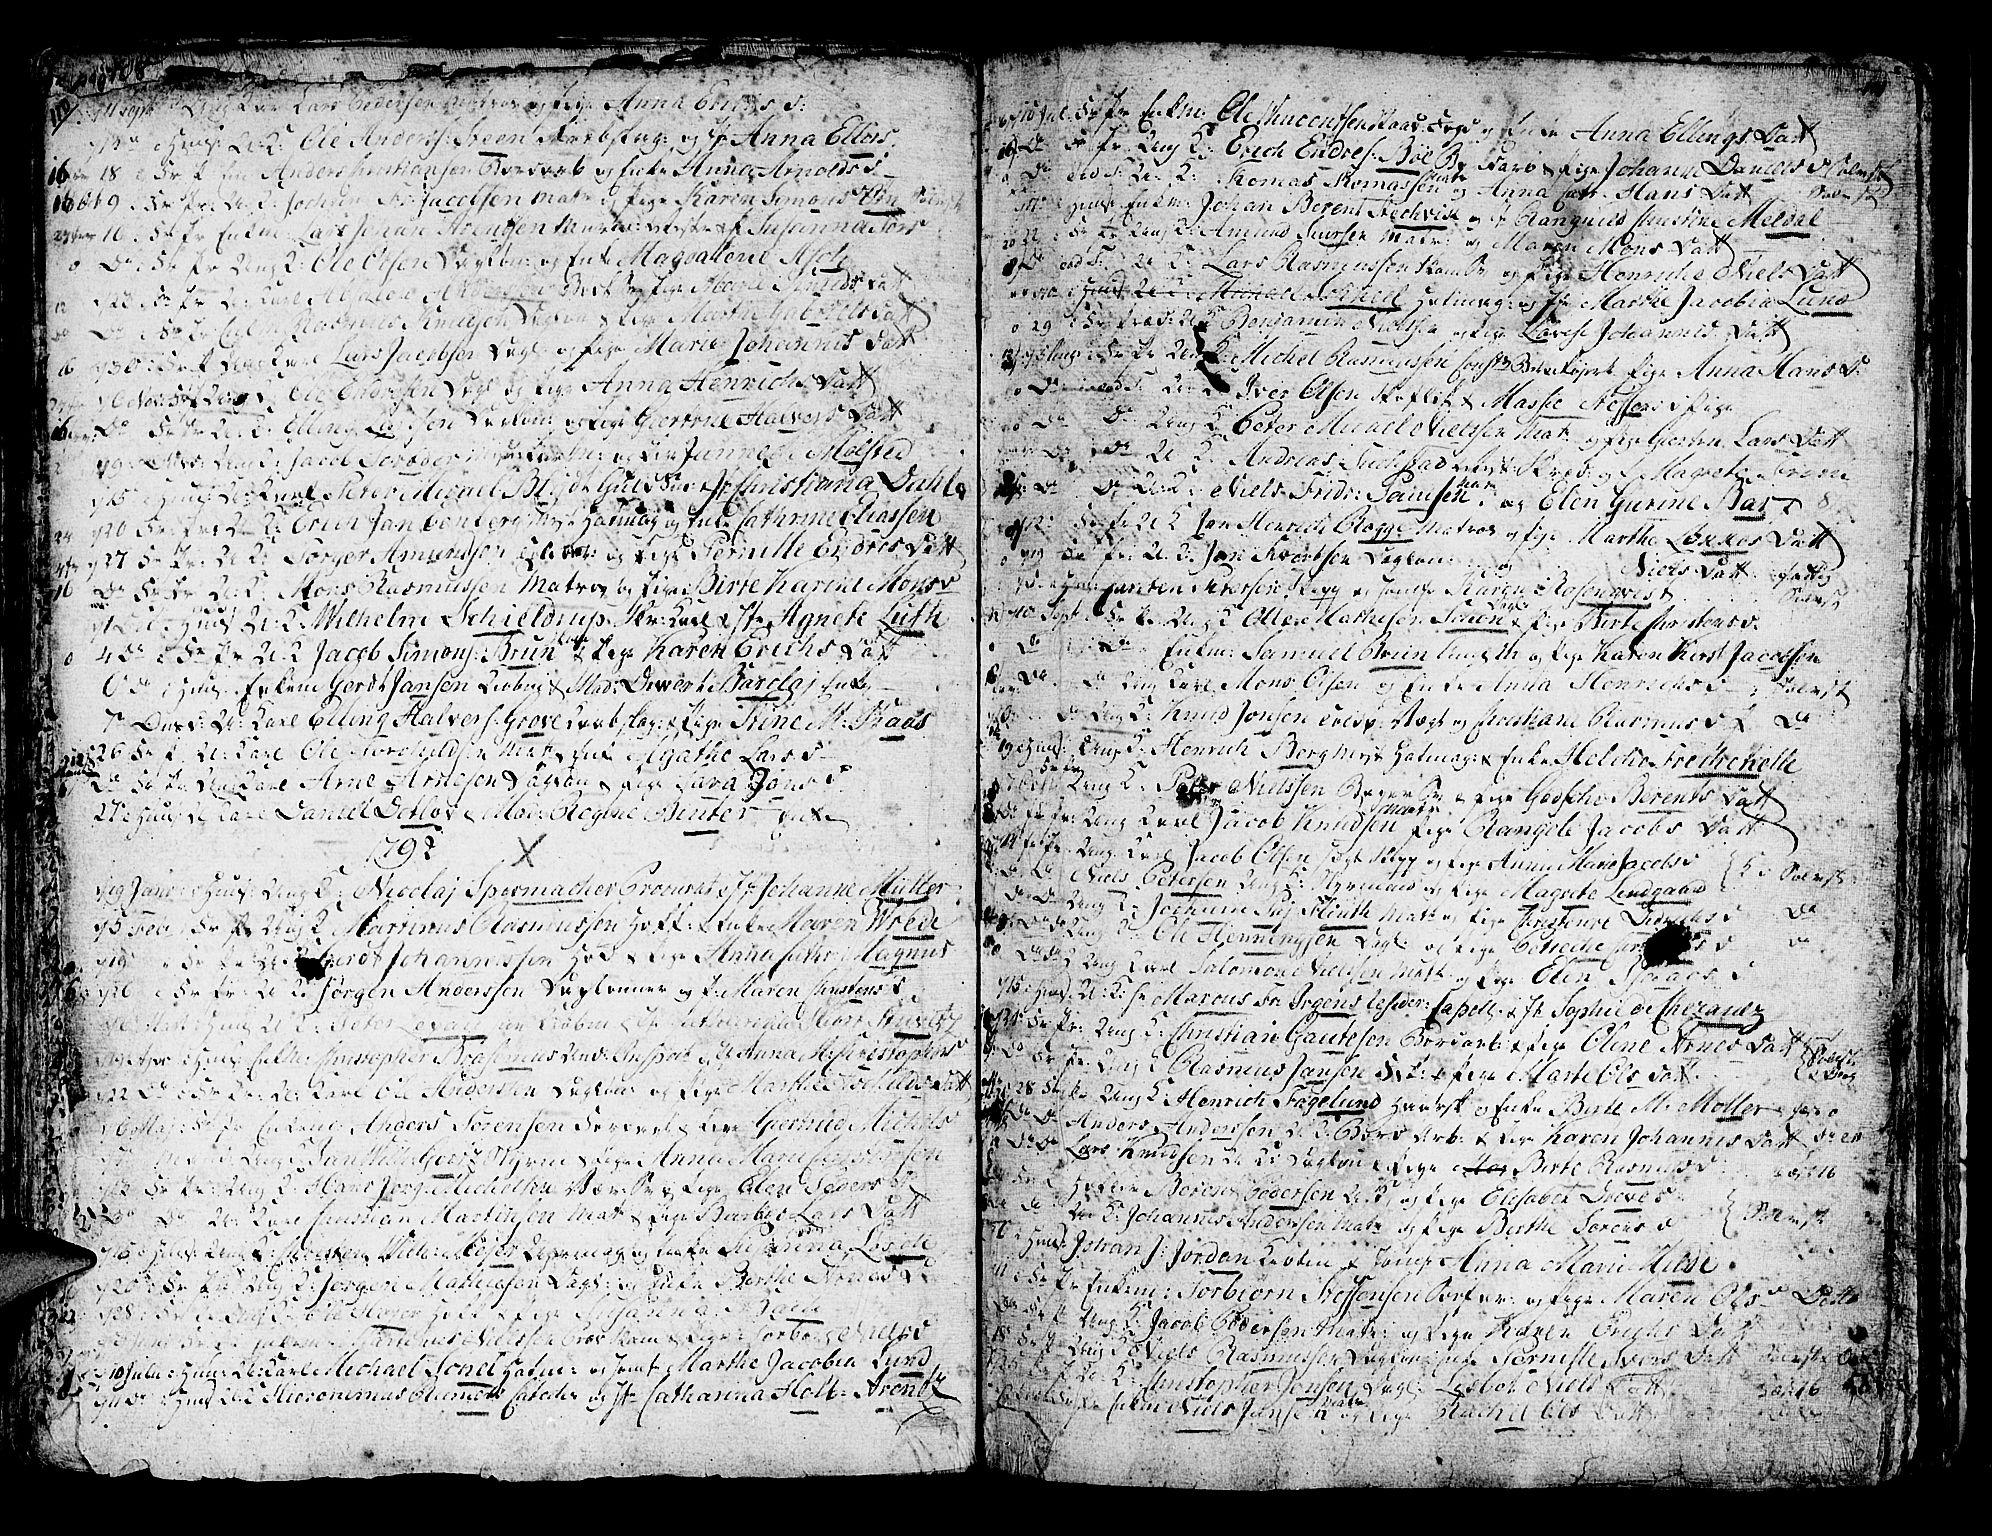 SAB, Domkirken Sokneprestembete, H/Haa/L0007: Ministerialbok nr. A 7, 1725-1826, s. 110-111